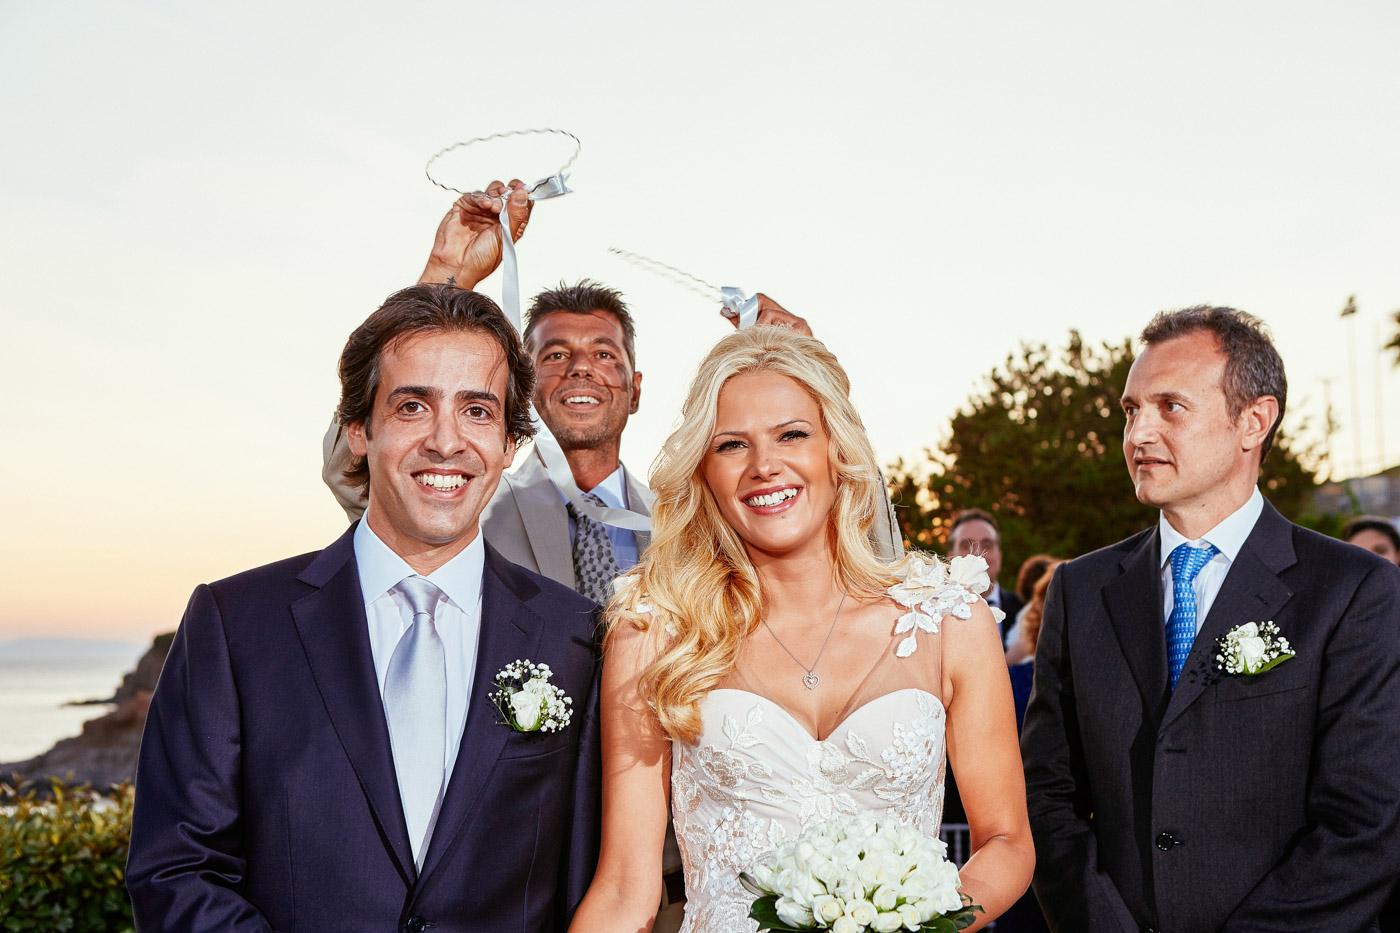 greek wedding customs